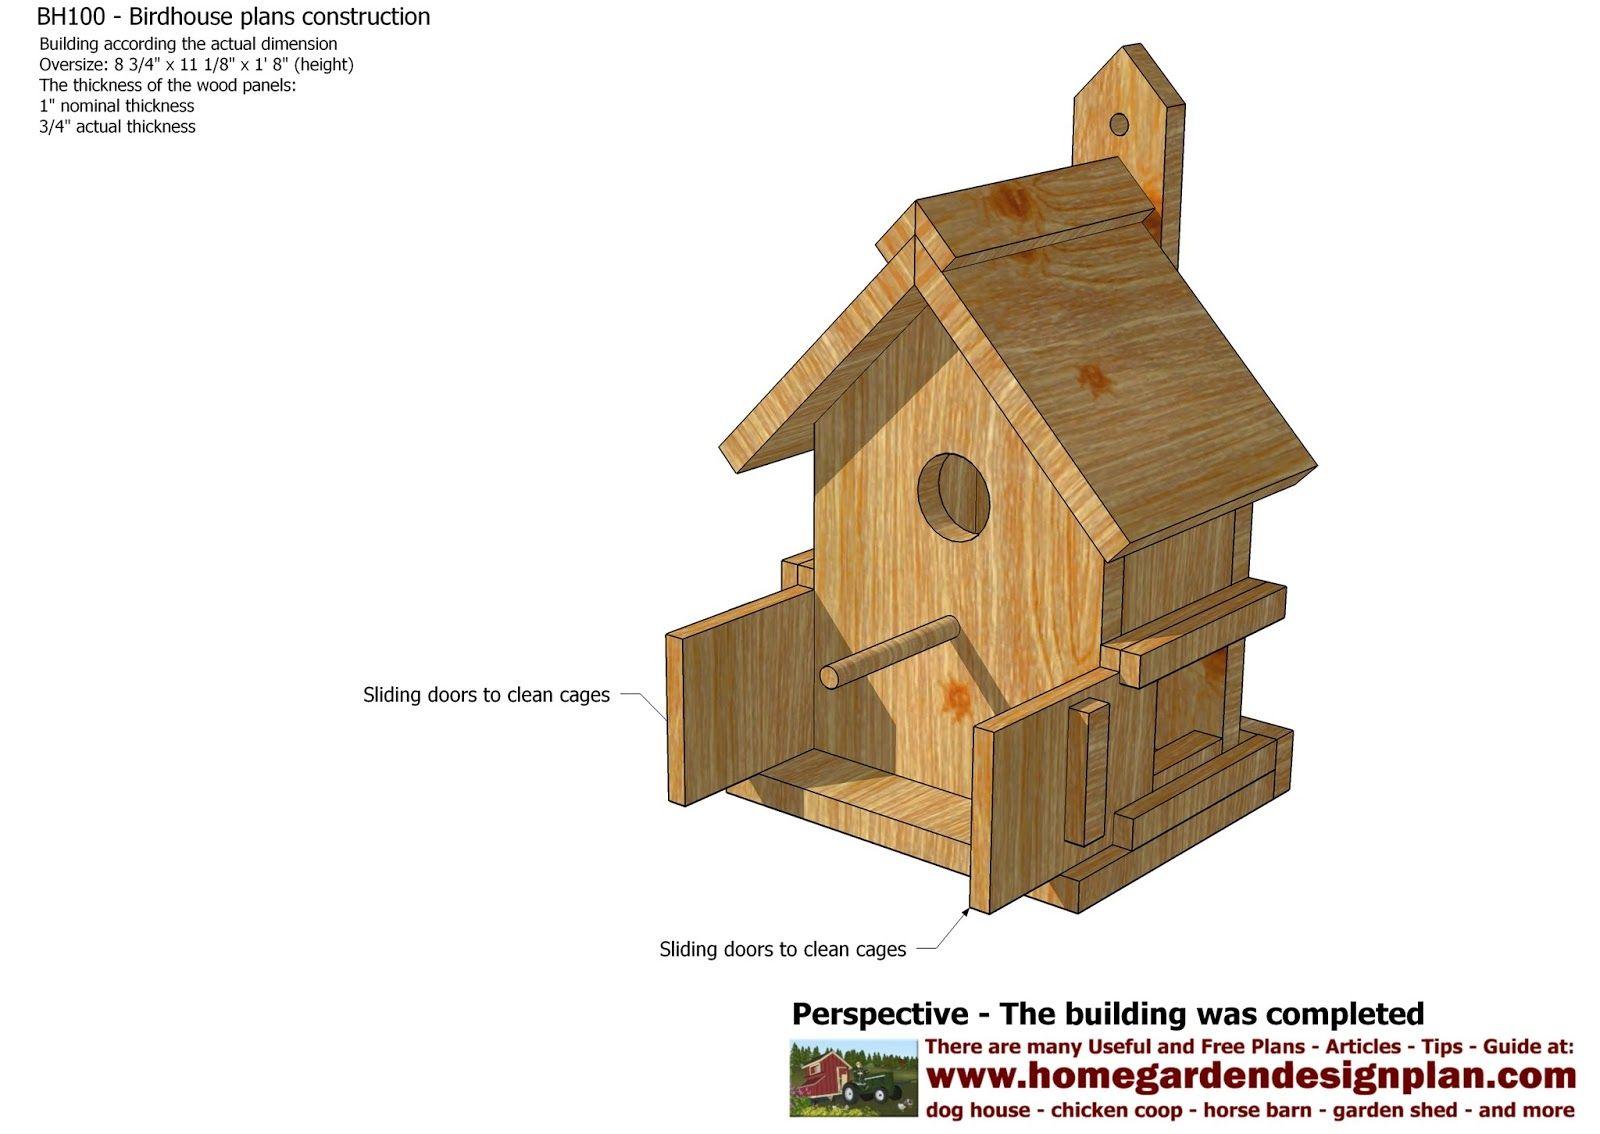 BH100 Bird House Plans Construction Bird House Design